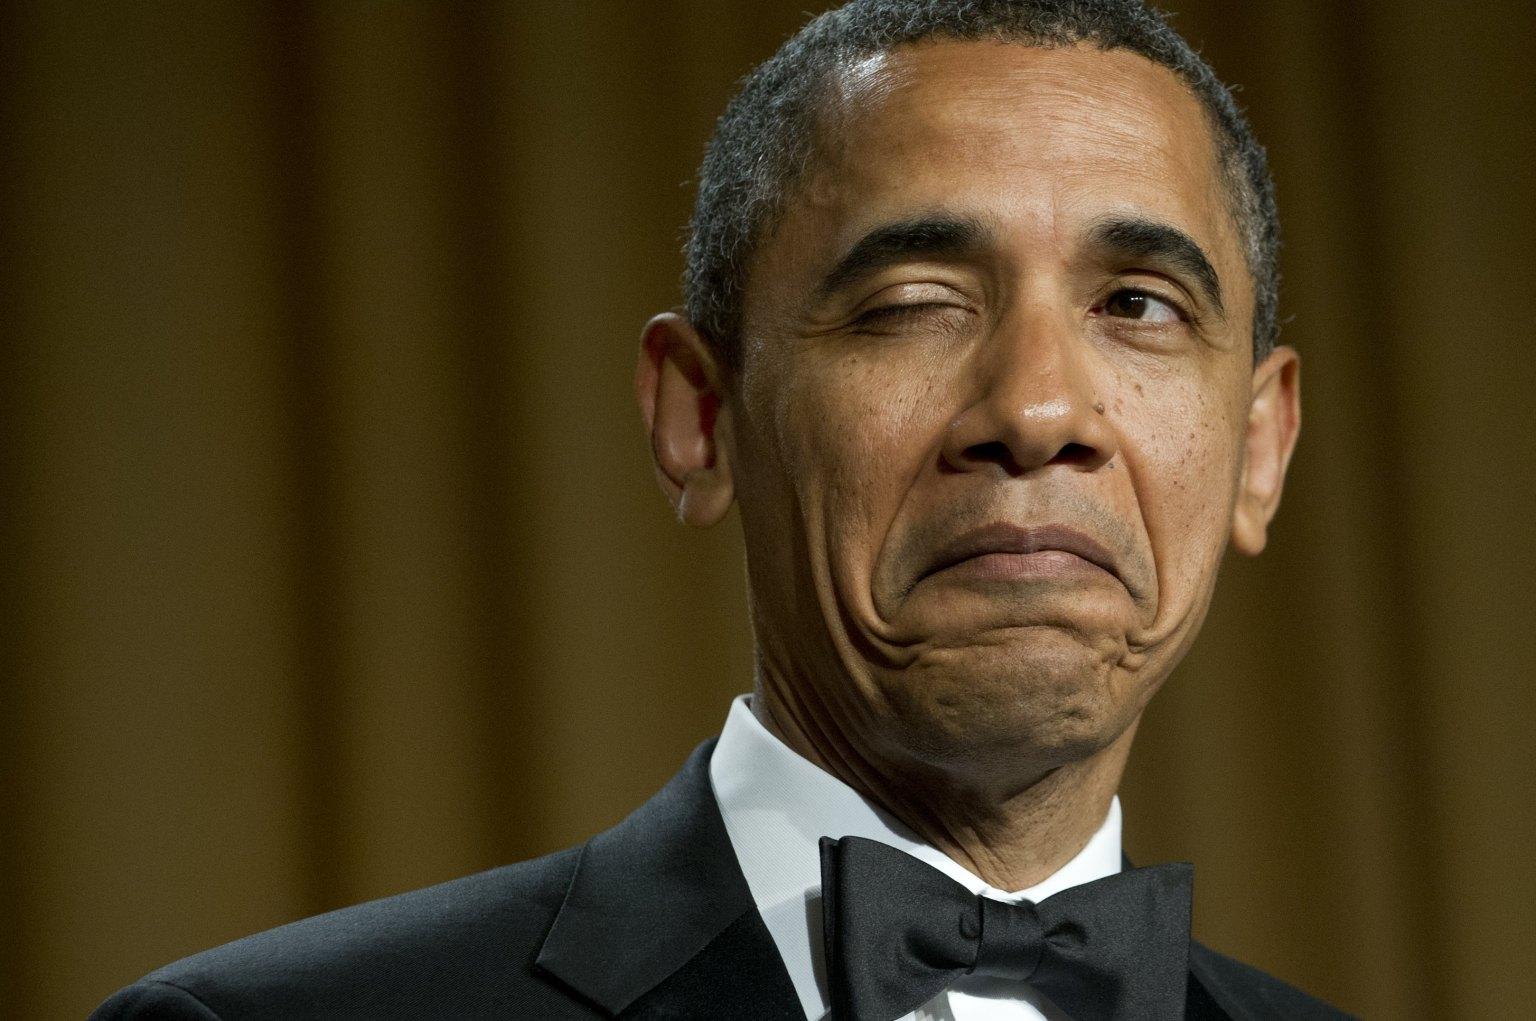 obama - photo #5